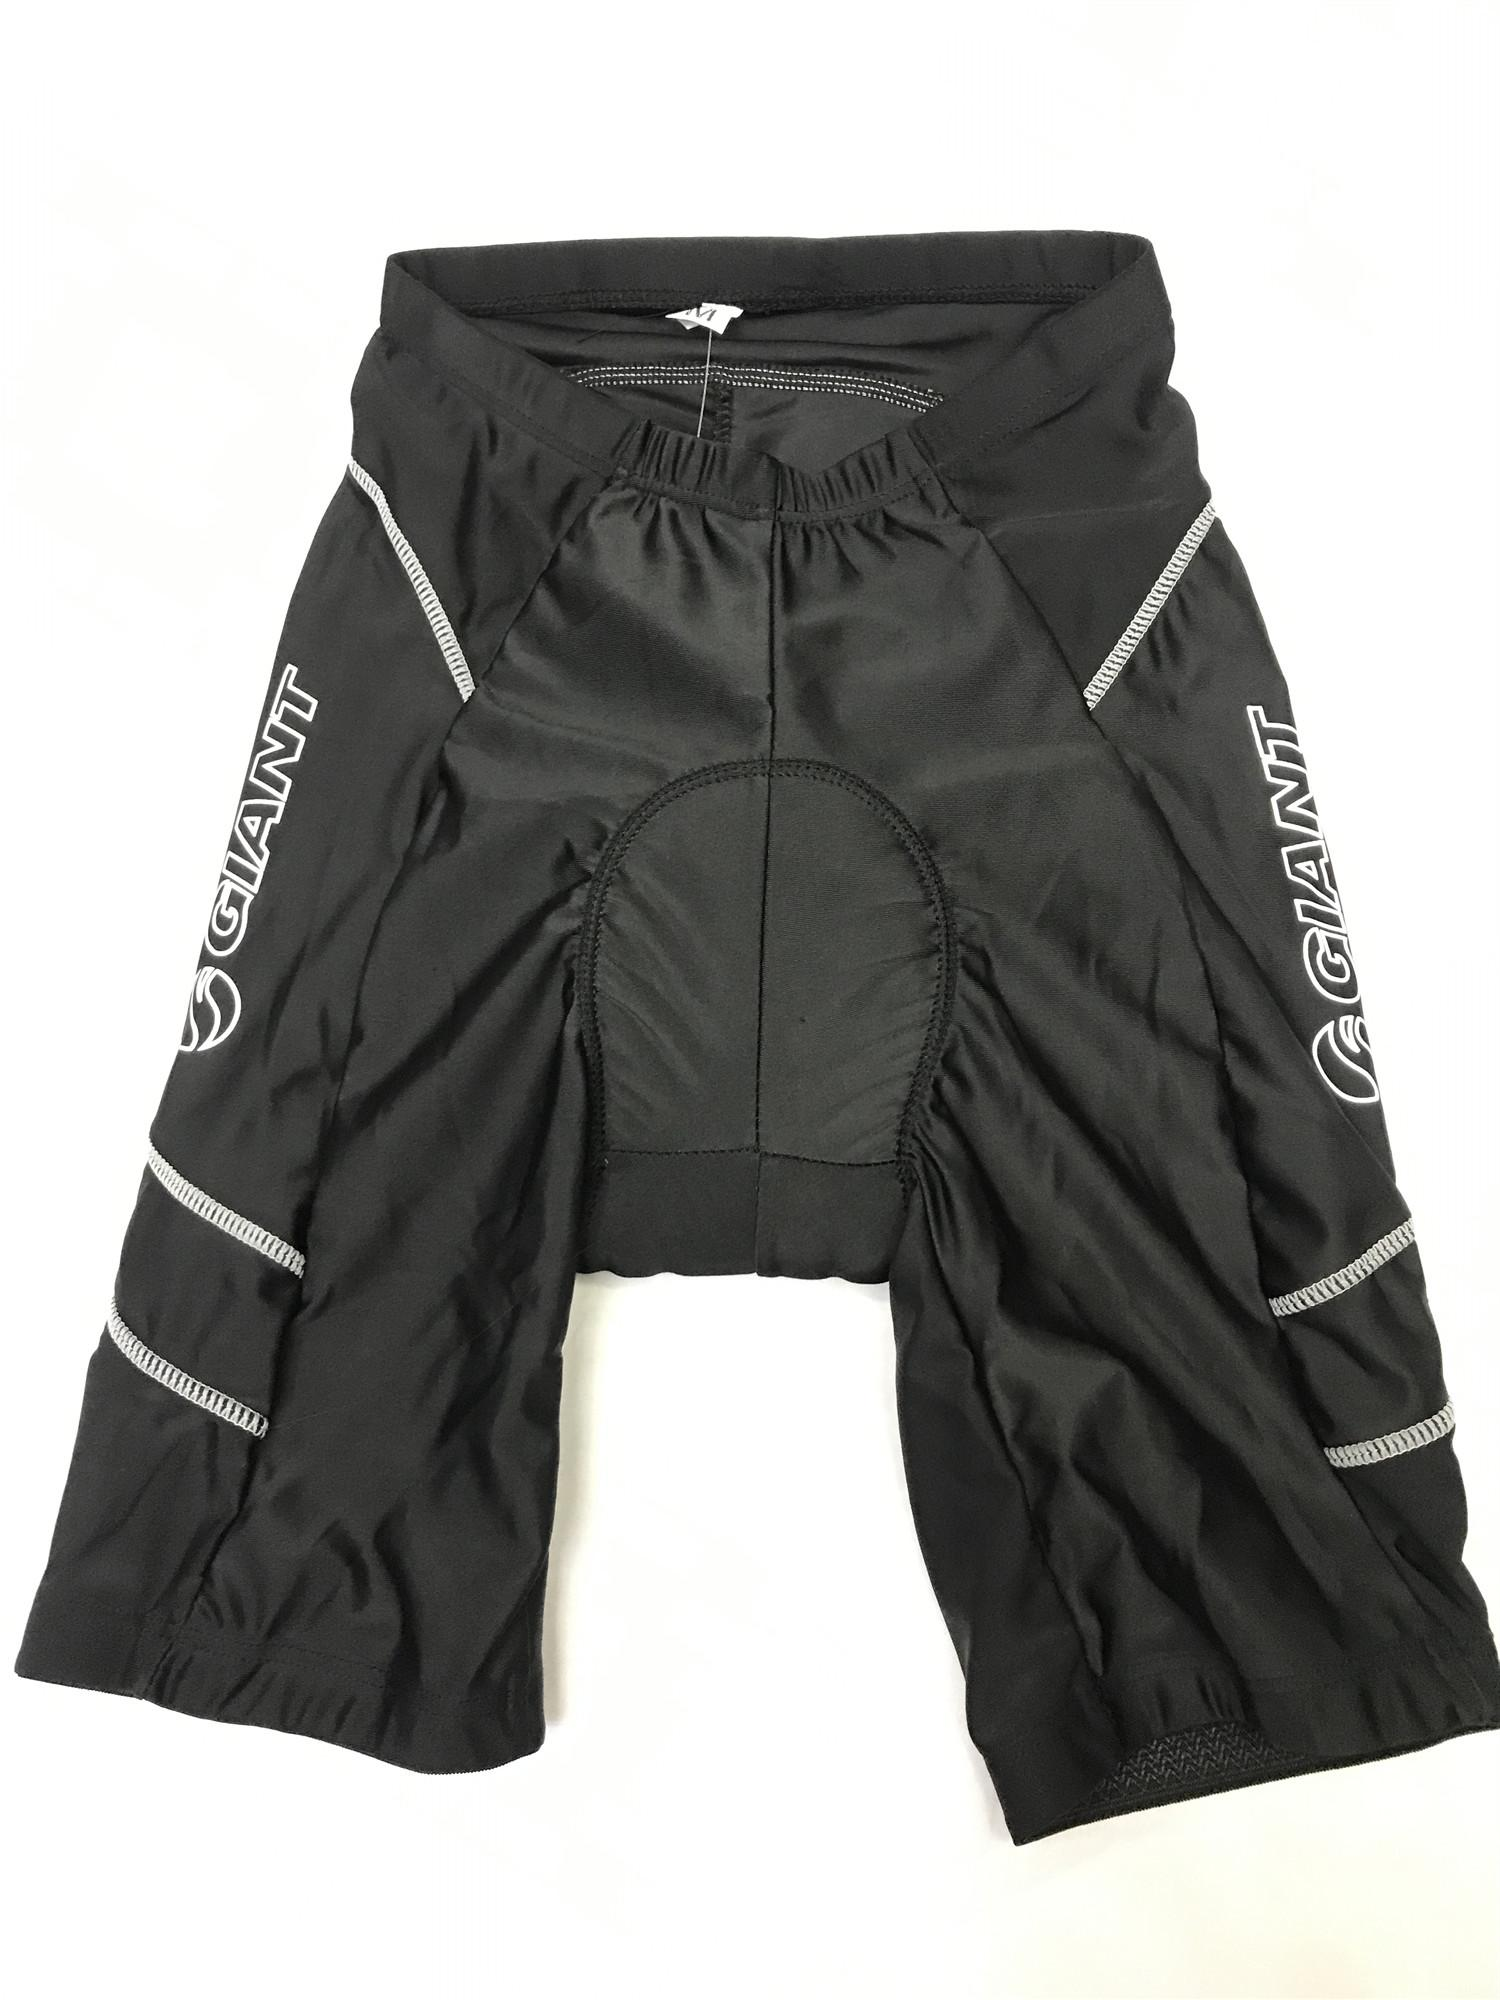 Bike Cycling Shorts W/ Sponge Paded Soft Brief Reflect Outdoors Sports  Biking Shorts